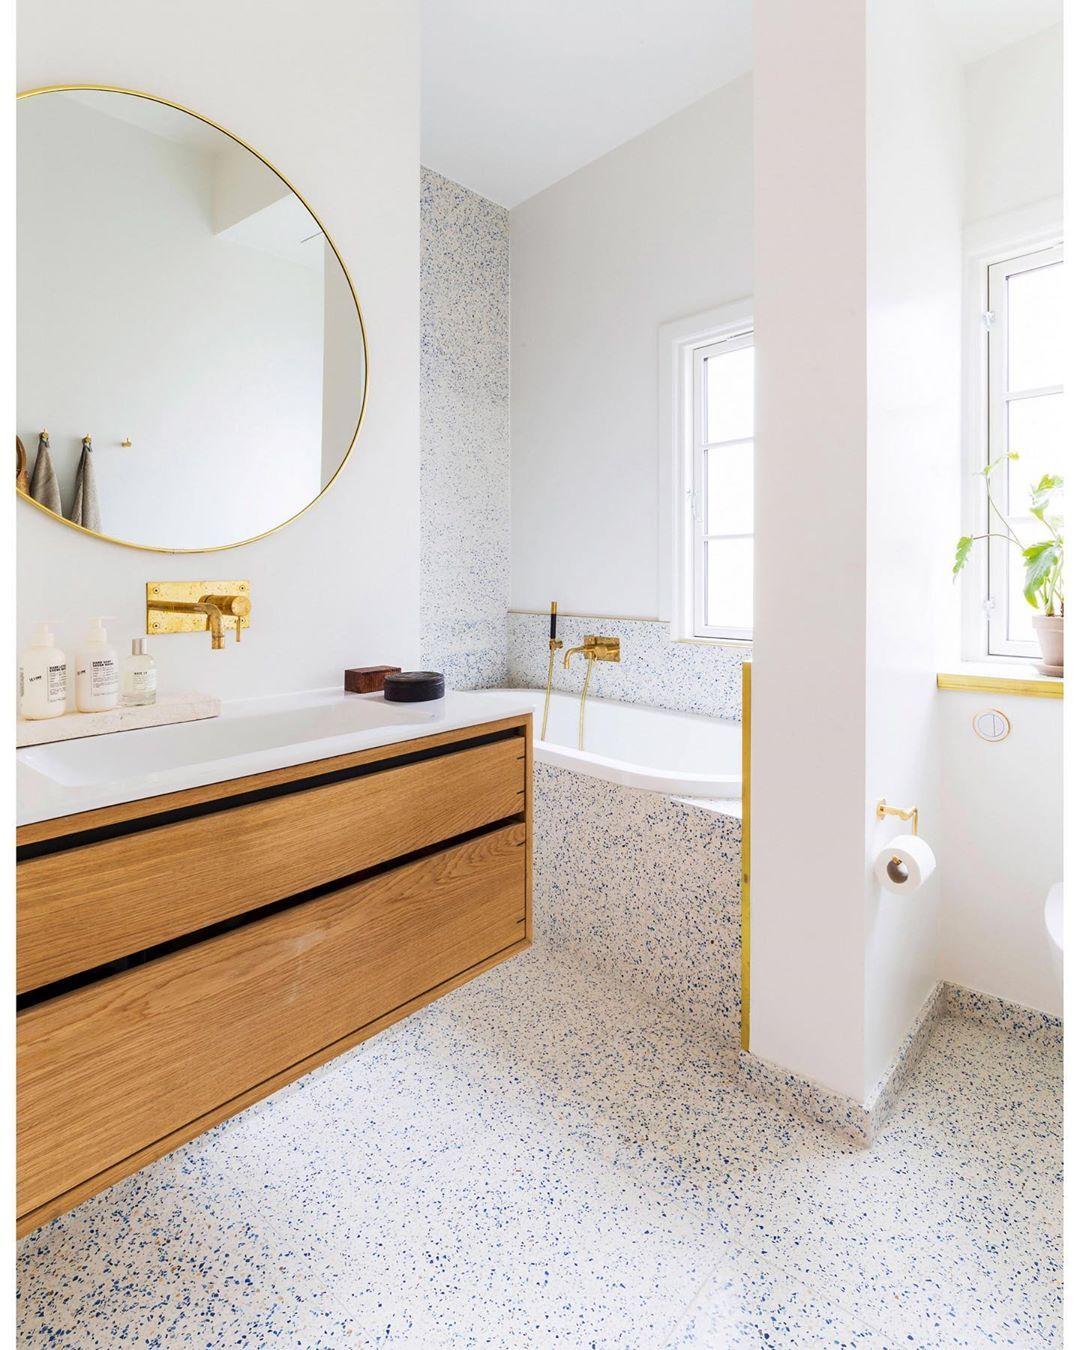 Huguet Mallorca S Instagram Post Bathrooms With Our Paris White Terrazzo Tiles And This Wonder In 2020 Bathroom Wood Shelves Bathroom Interior Brown Bathroom Decor